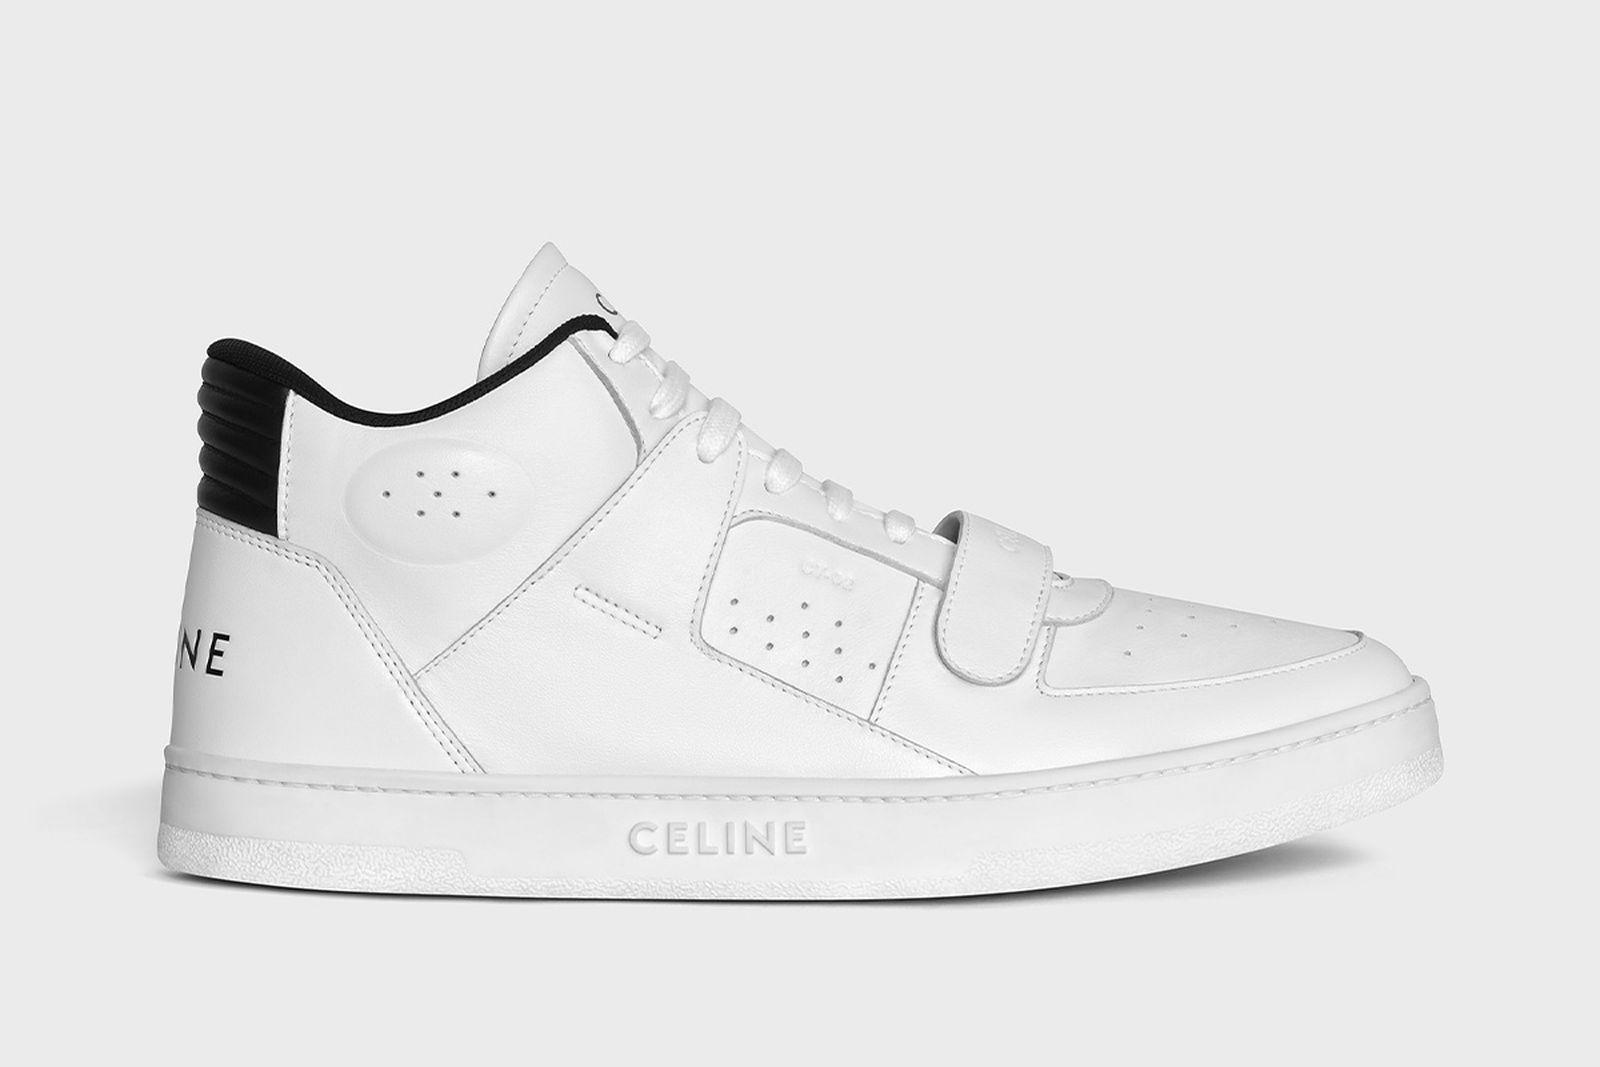 celine-trainer-1-release-date-price-16